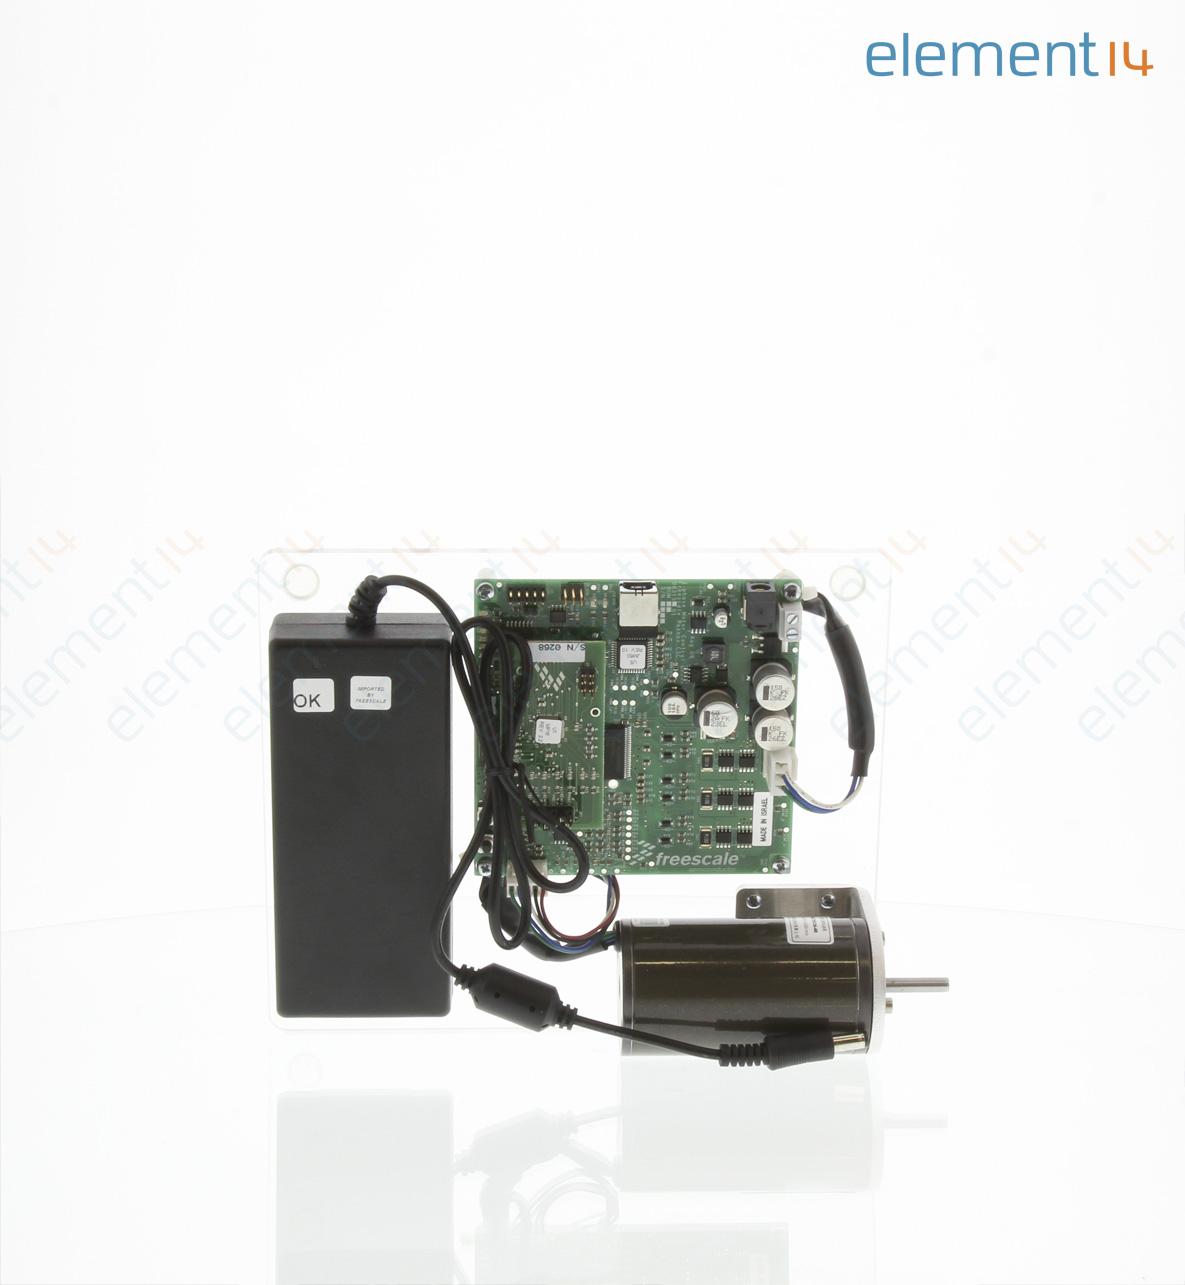 3phaselv kit nxp motor control kit 3 phase bldc pmsm for 3 phase motor control